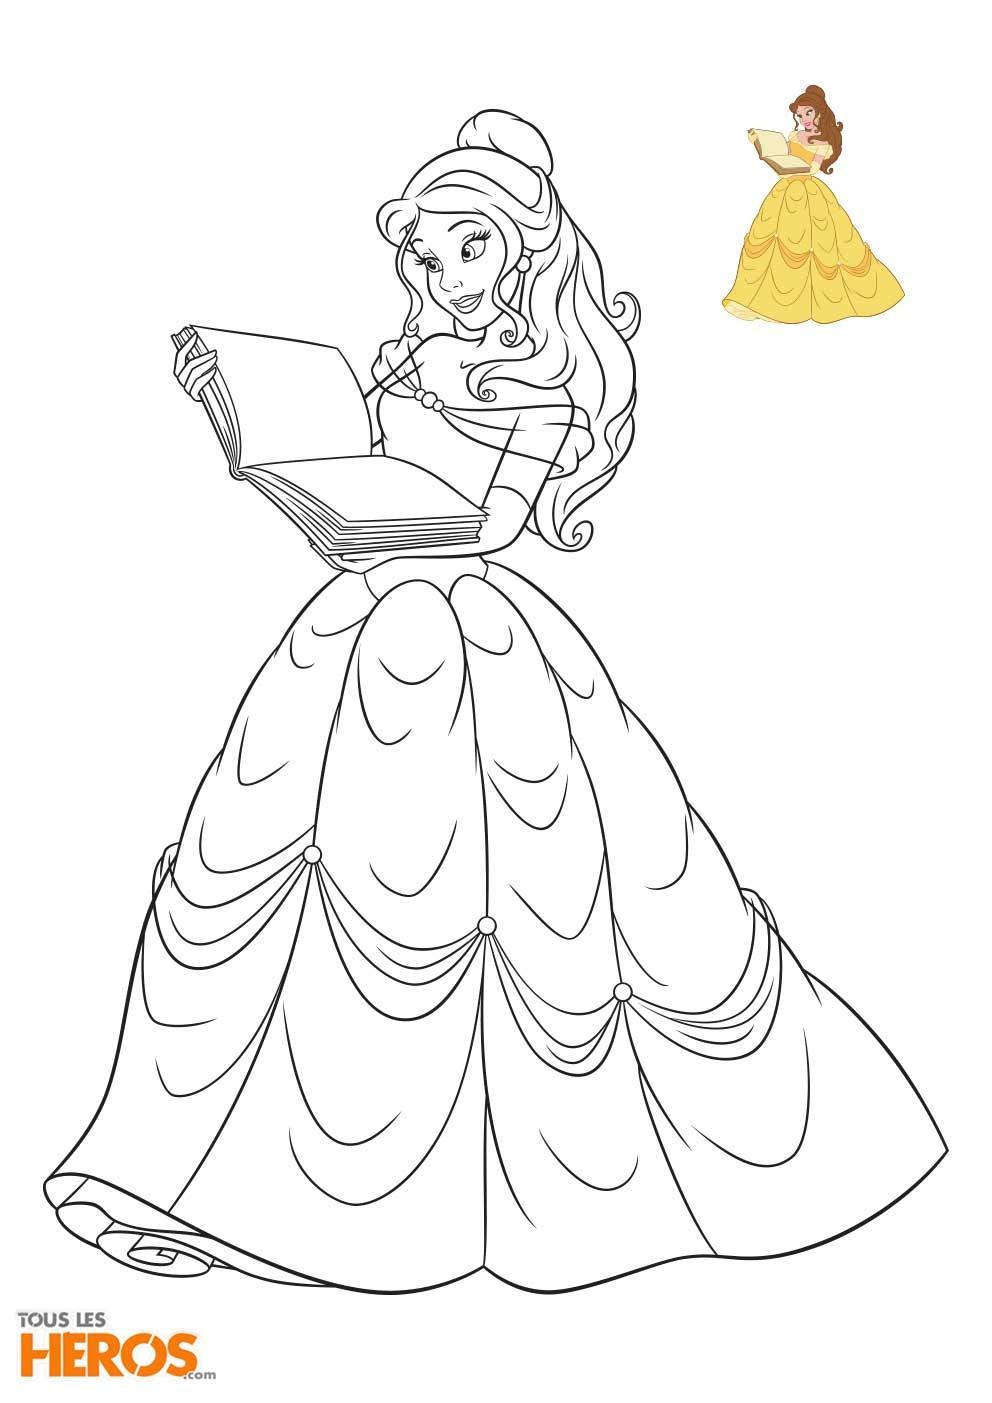 Dessin A Imprimer Princesse Ariel intérieur Dessin Walt Disney À Imprimer